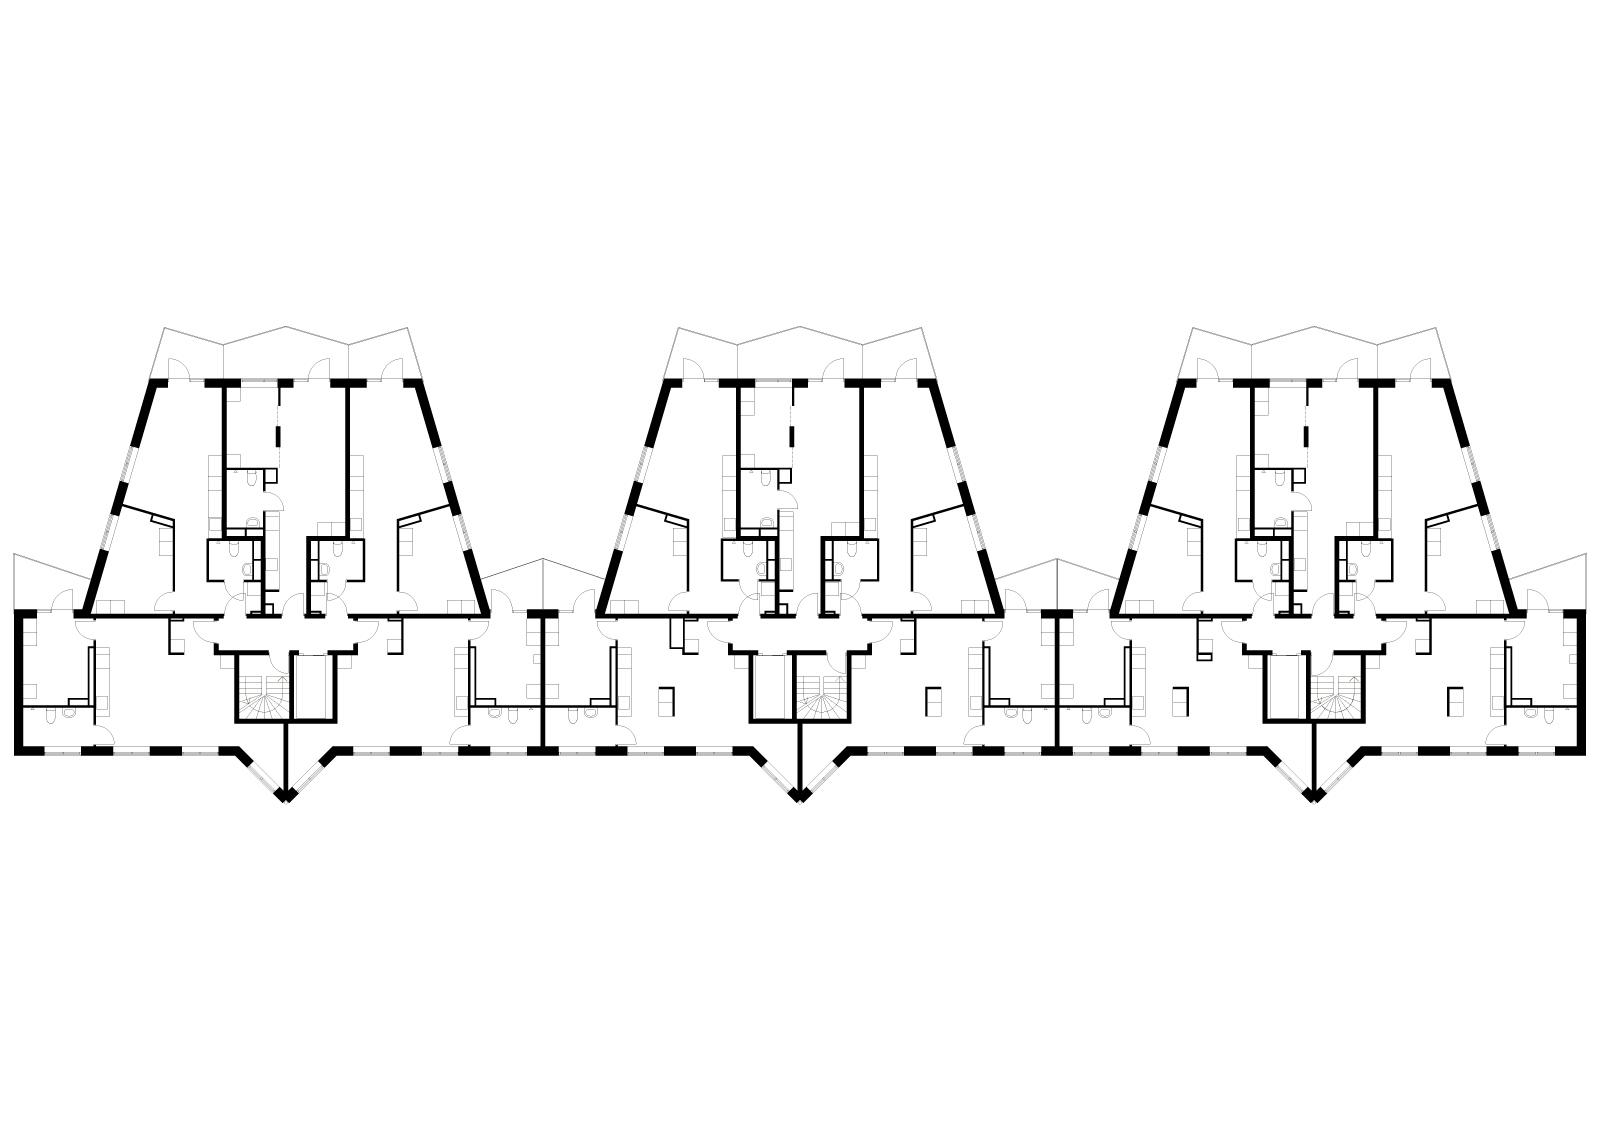 marstatypplanb.jpg